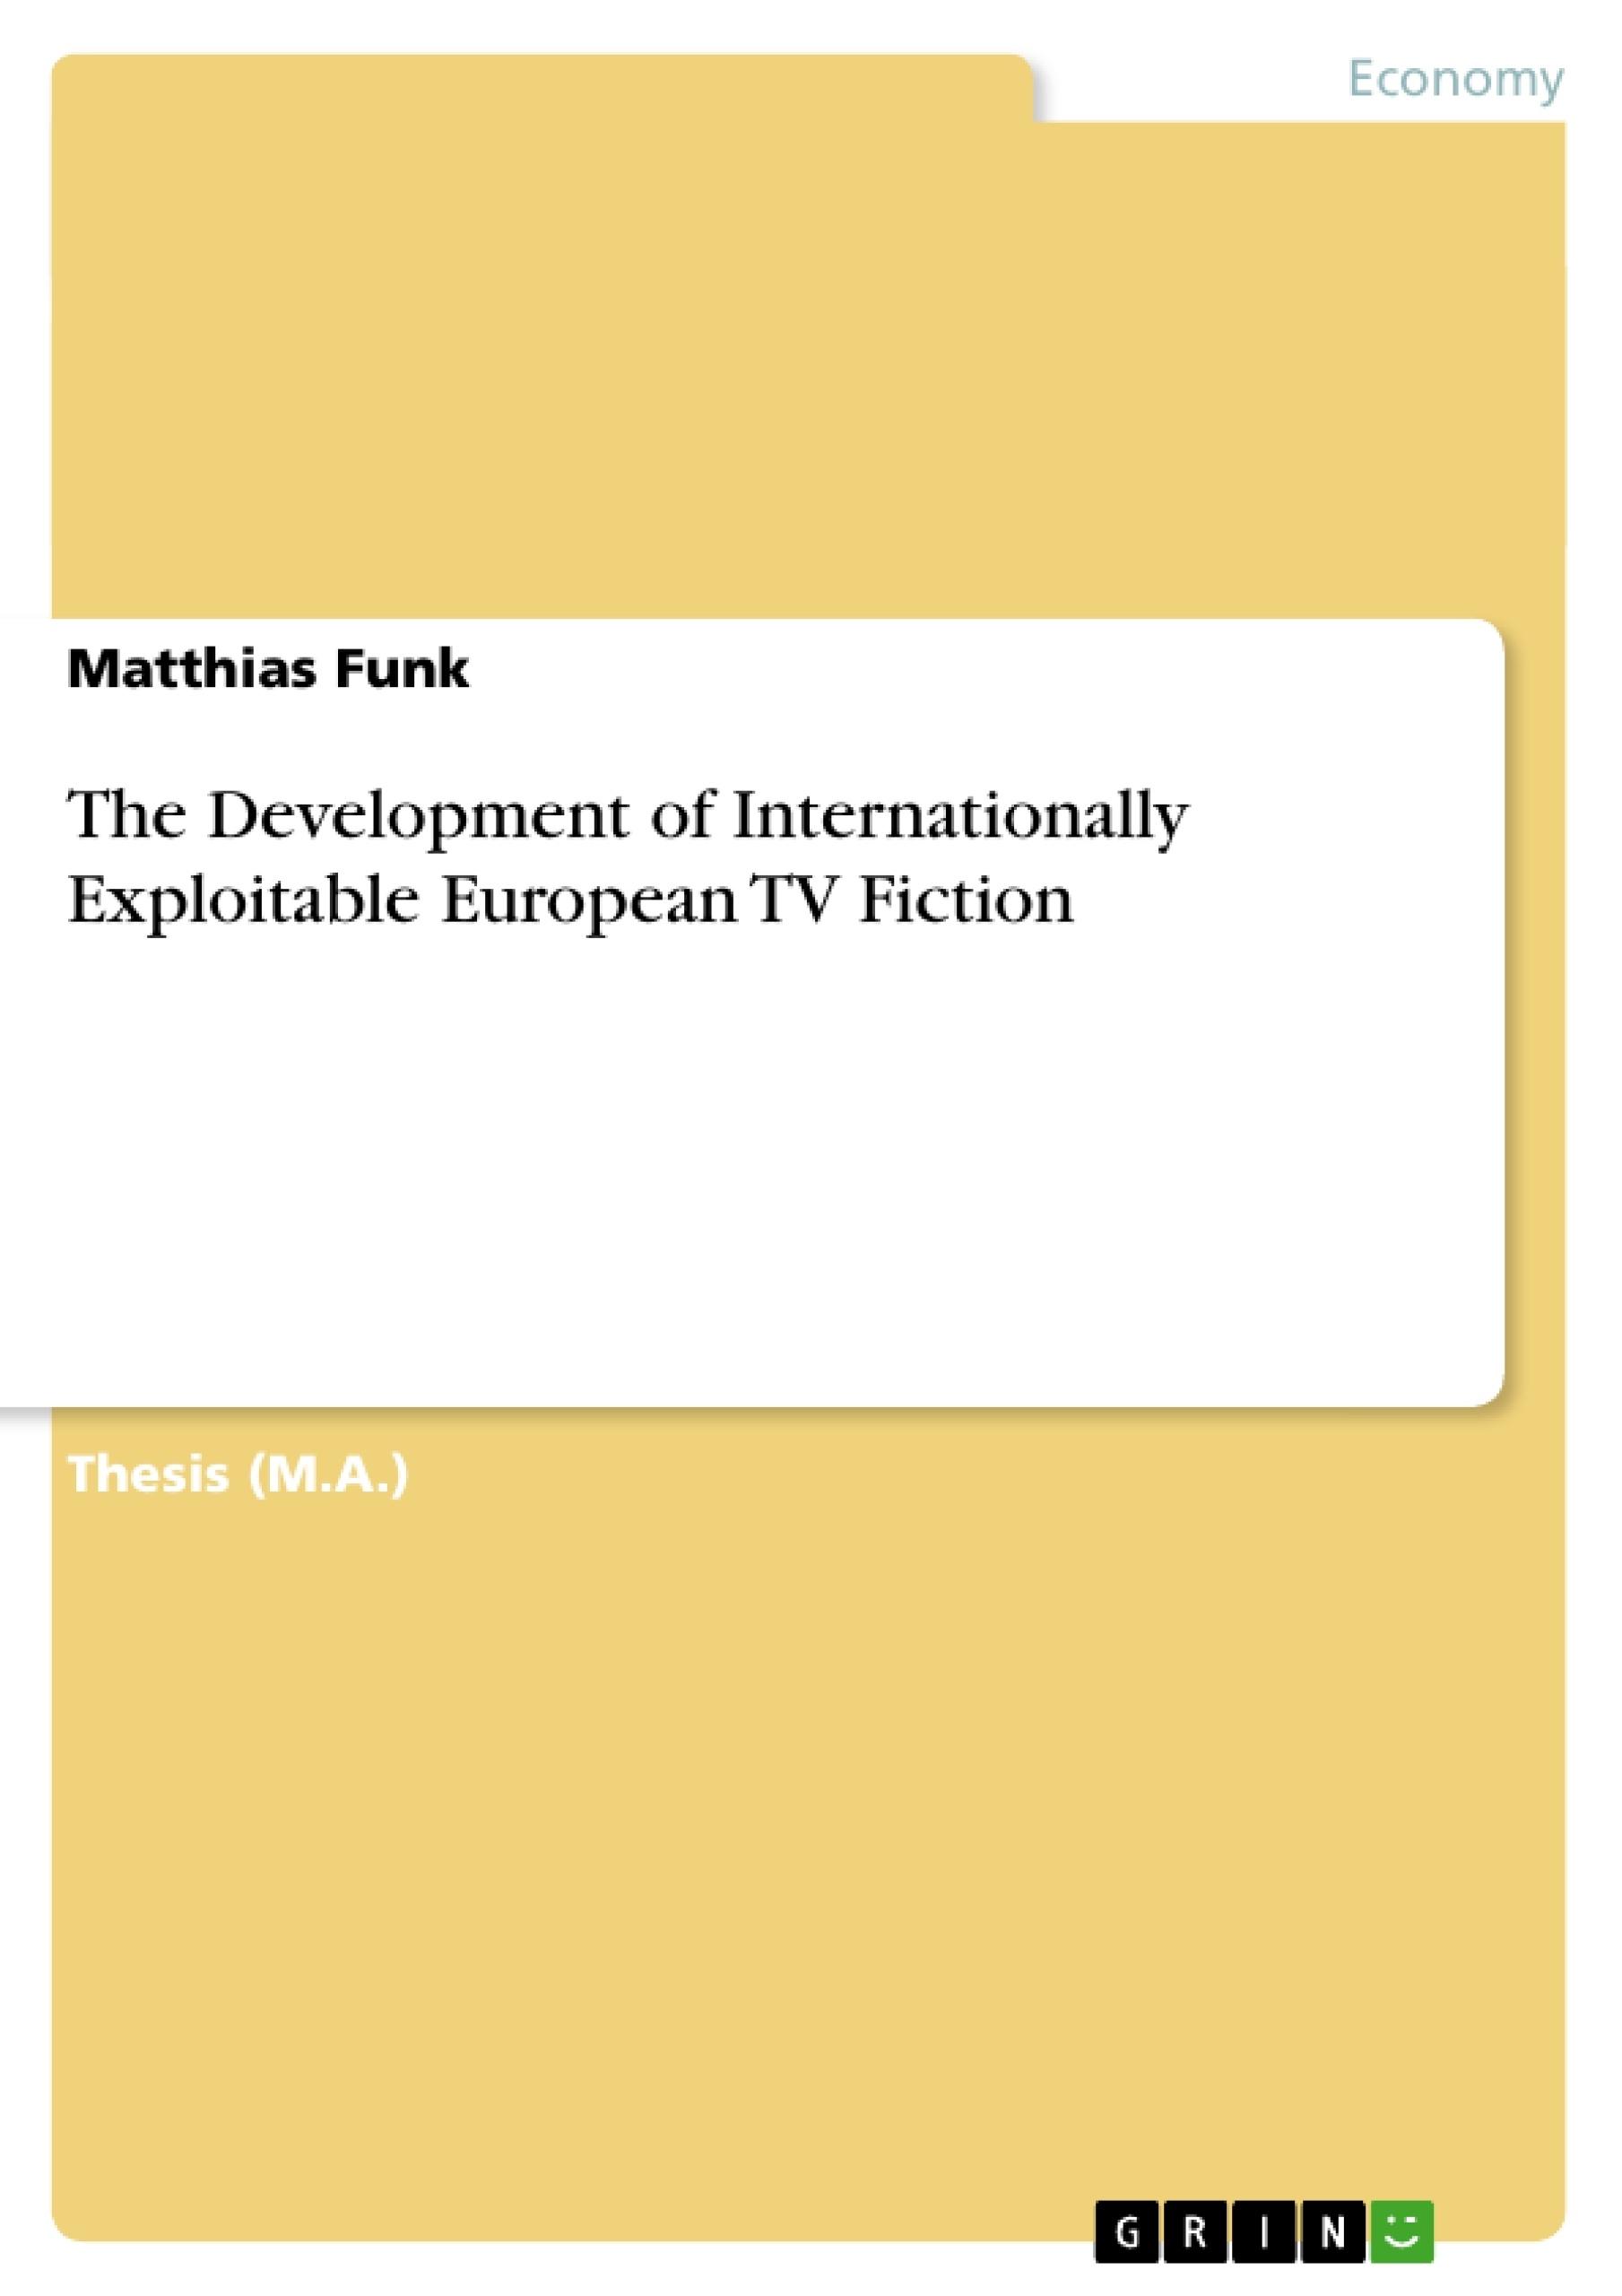 Title: The Development of Internationally Exploitable European TV Fiction